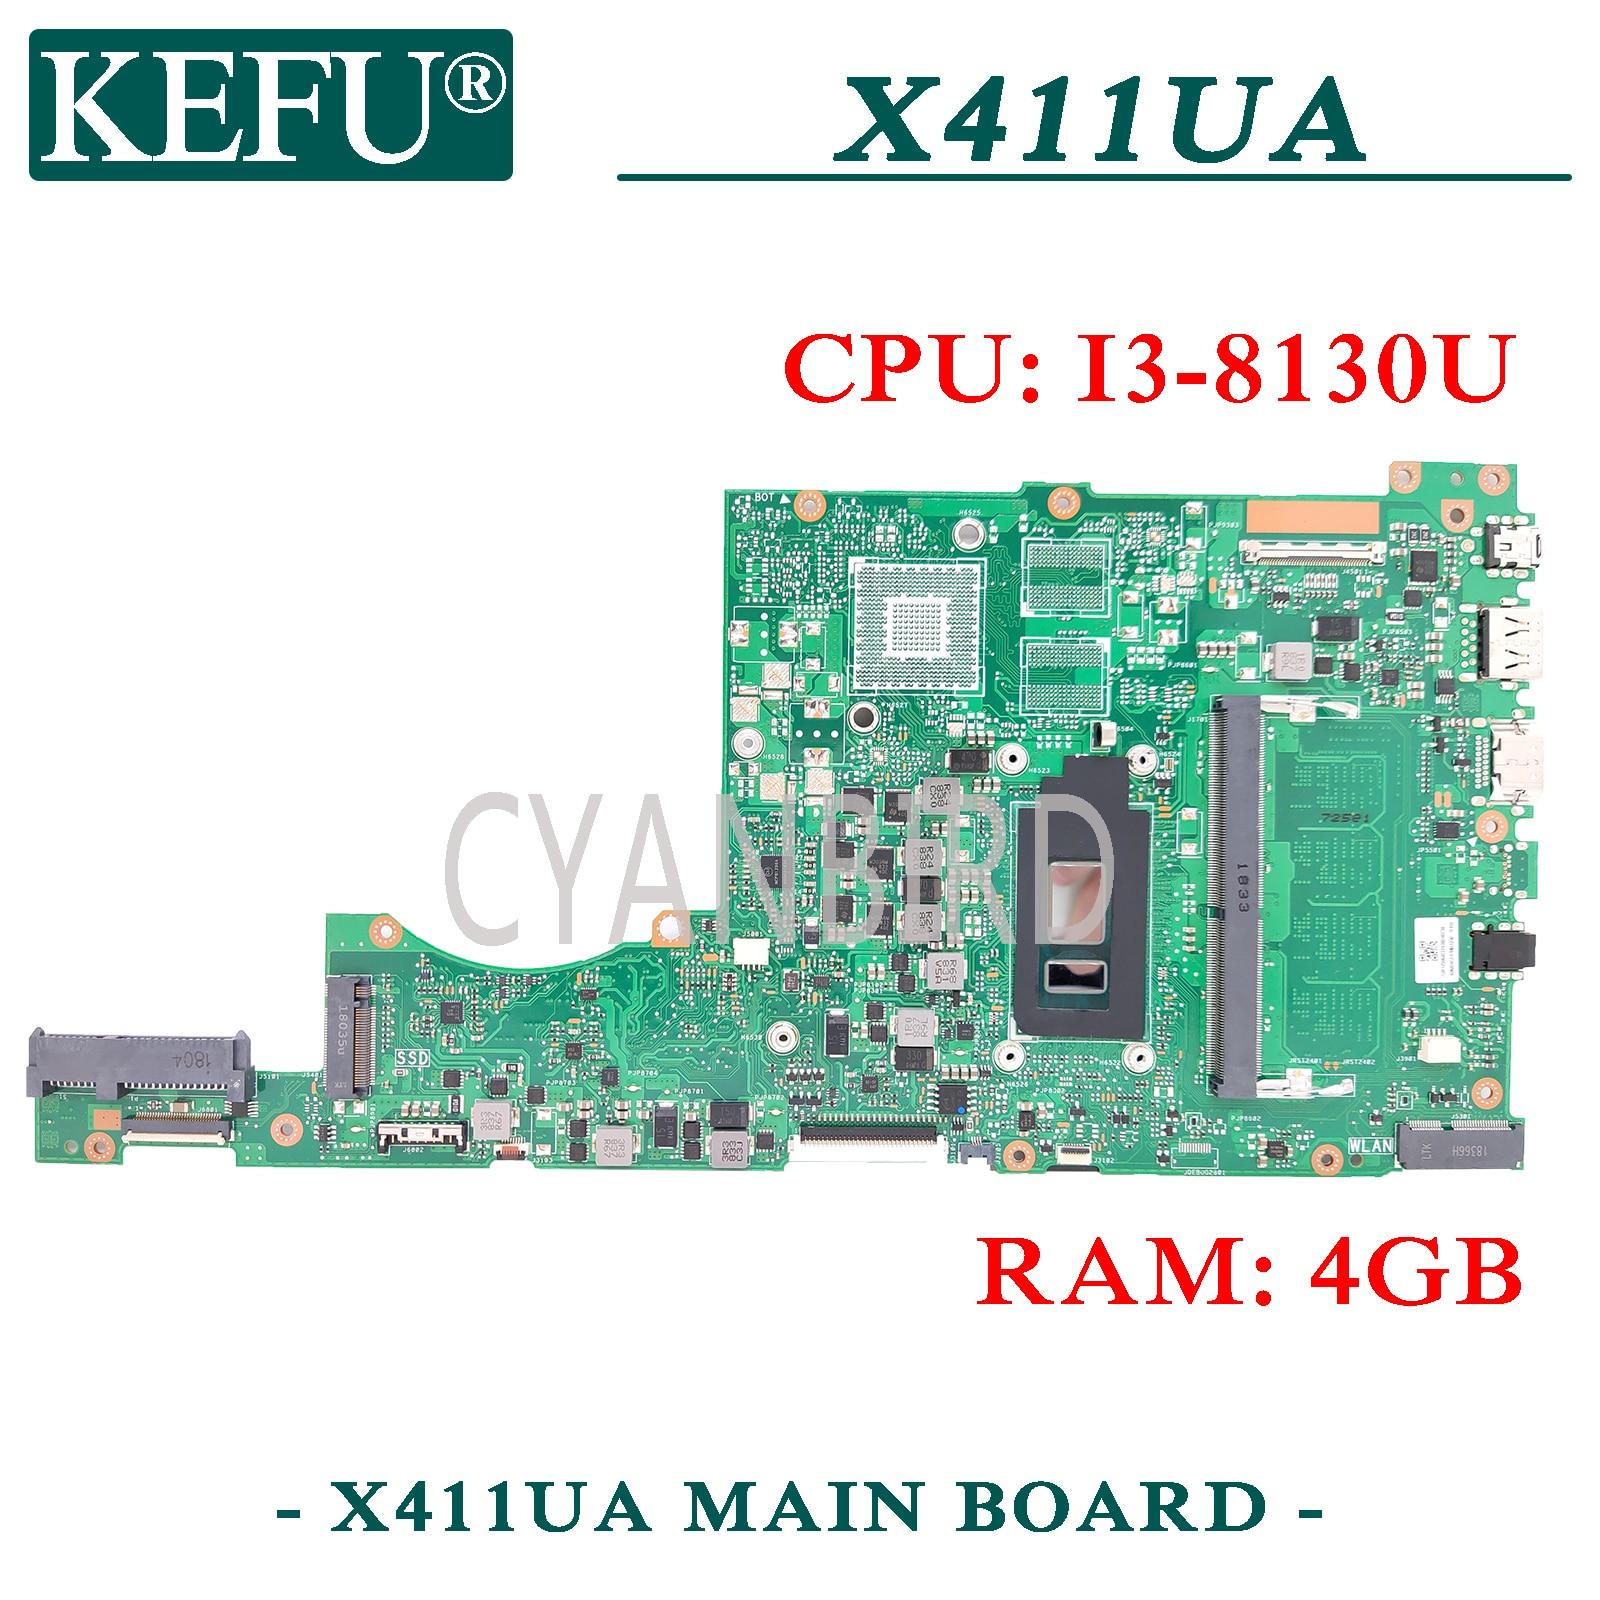 KEFU X411UA اللوحة الأصلية ل ASUS X411UA X411UQ X411U S4100UA S4100UQ S4100U مع 4GB-RAM I3-8130U اللوحة المحمول